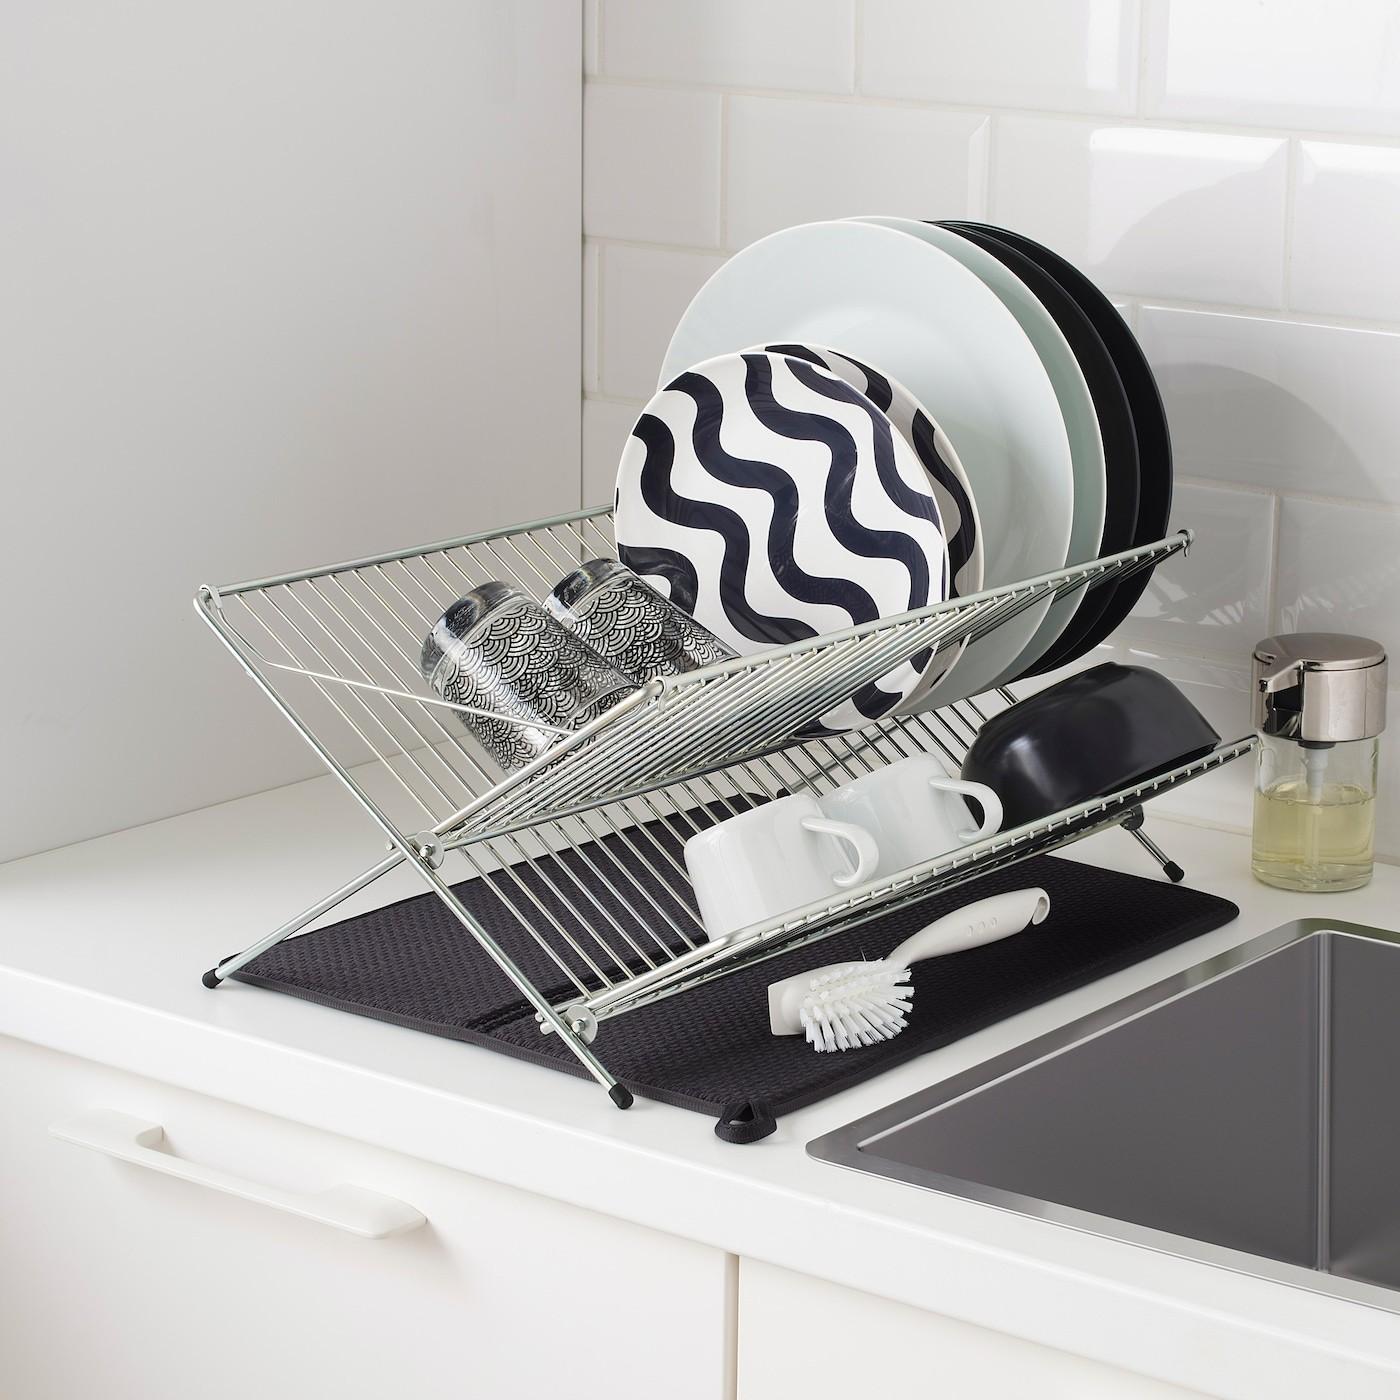 НЮХОЛИД Коврик для сушки посуды темно-серый